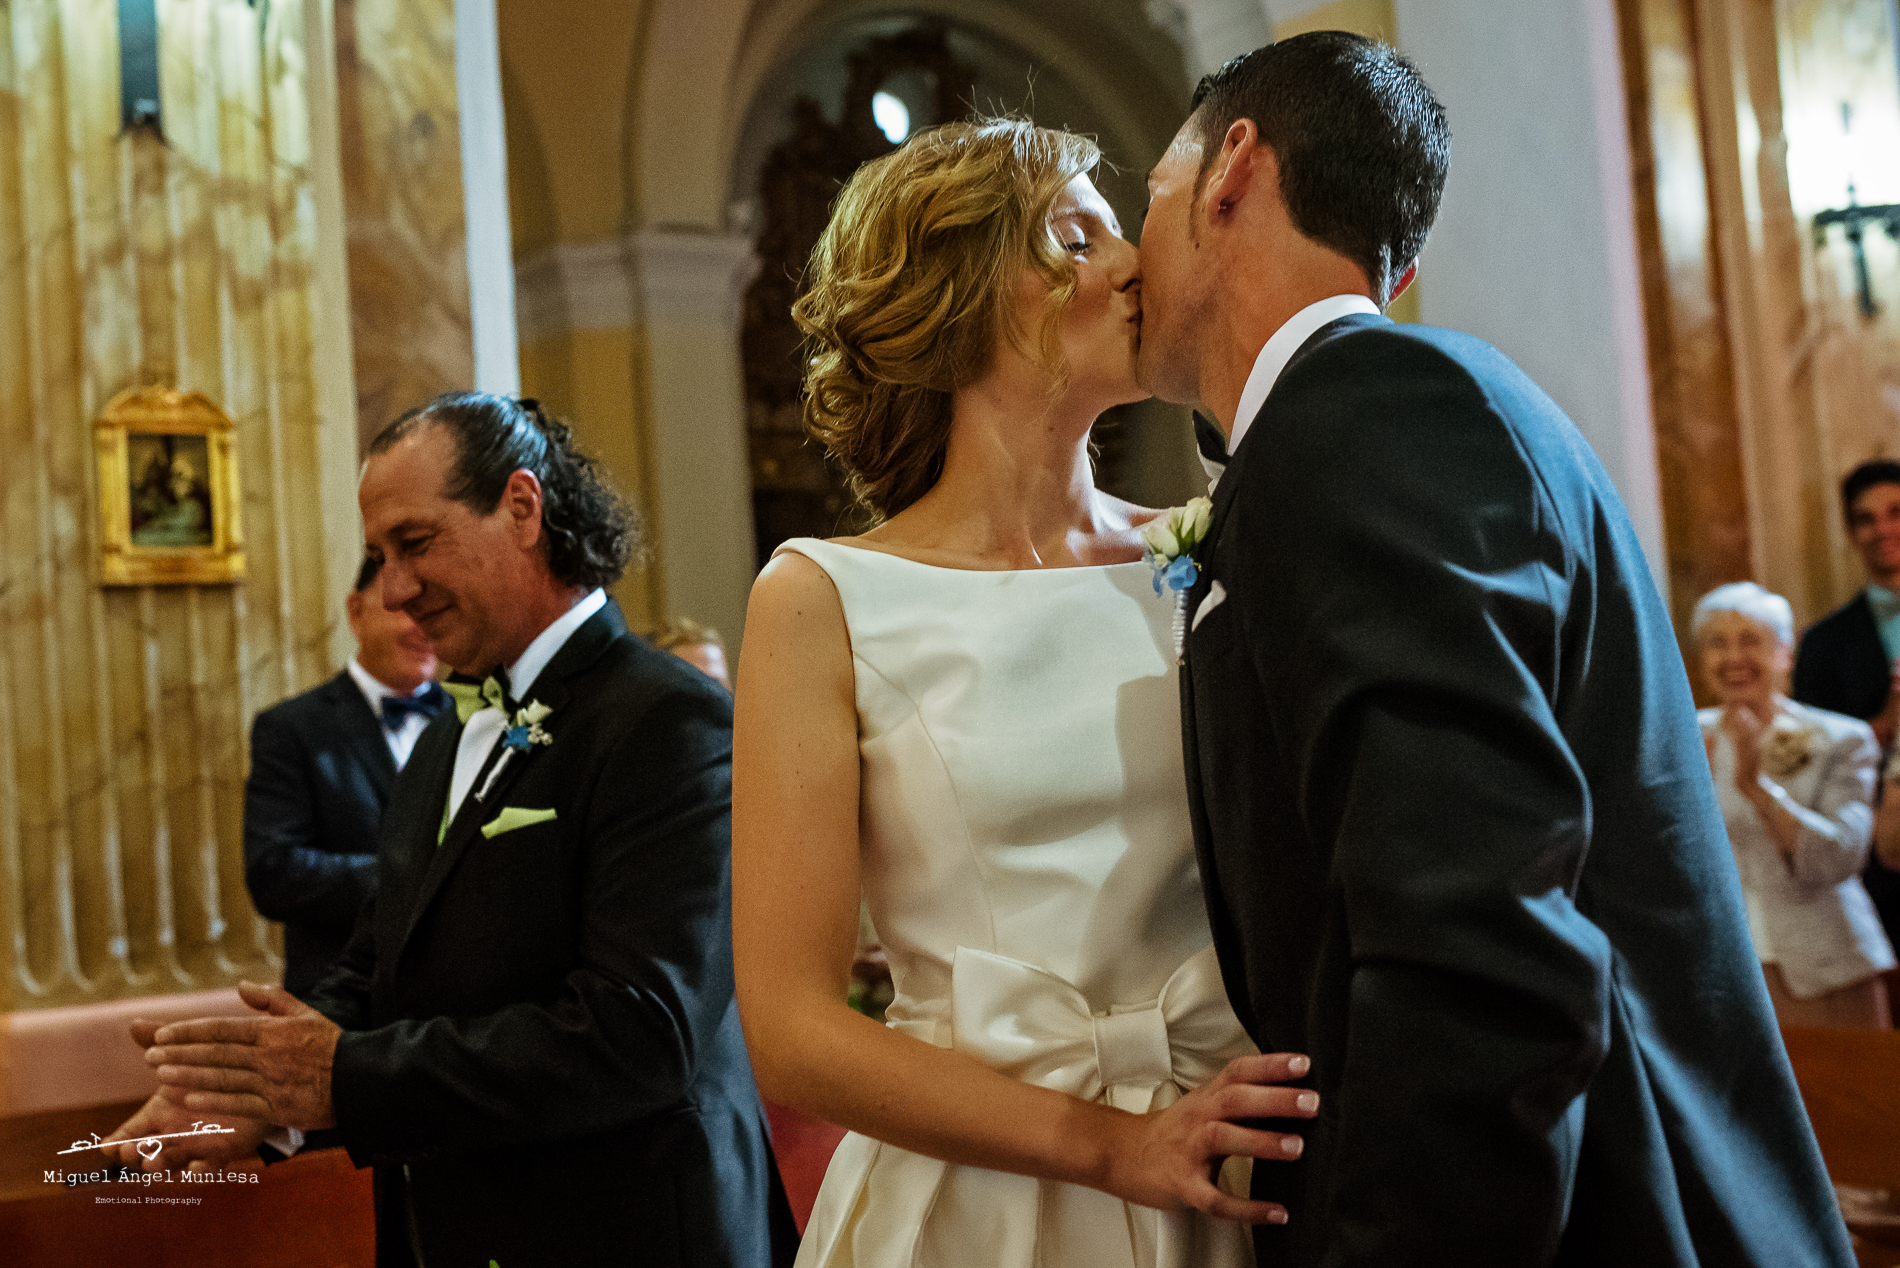 boda, fotografia de boda, boda zaragoza, fotografia, wedding, wedding photography, miguel angel muniesa, fotografo boda Zaragoza, fotografo boda, destination wedding_ 024